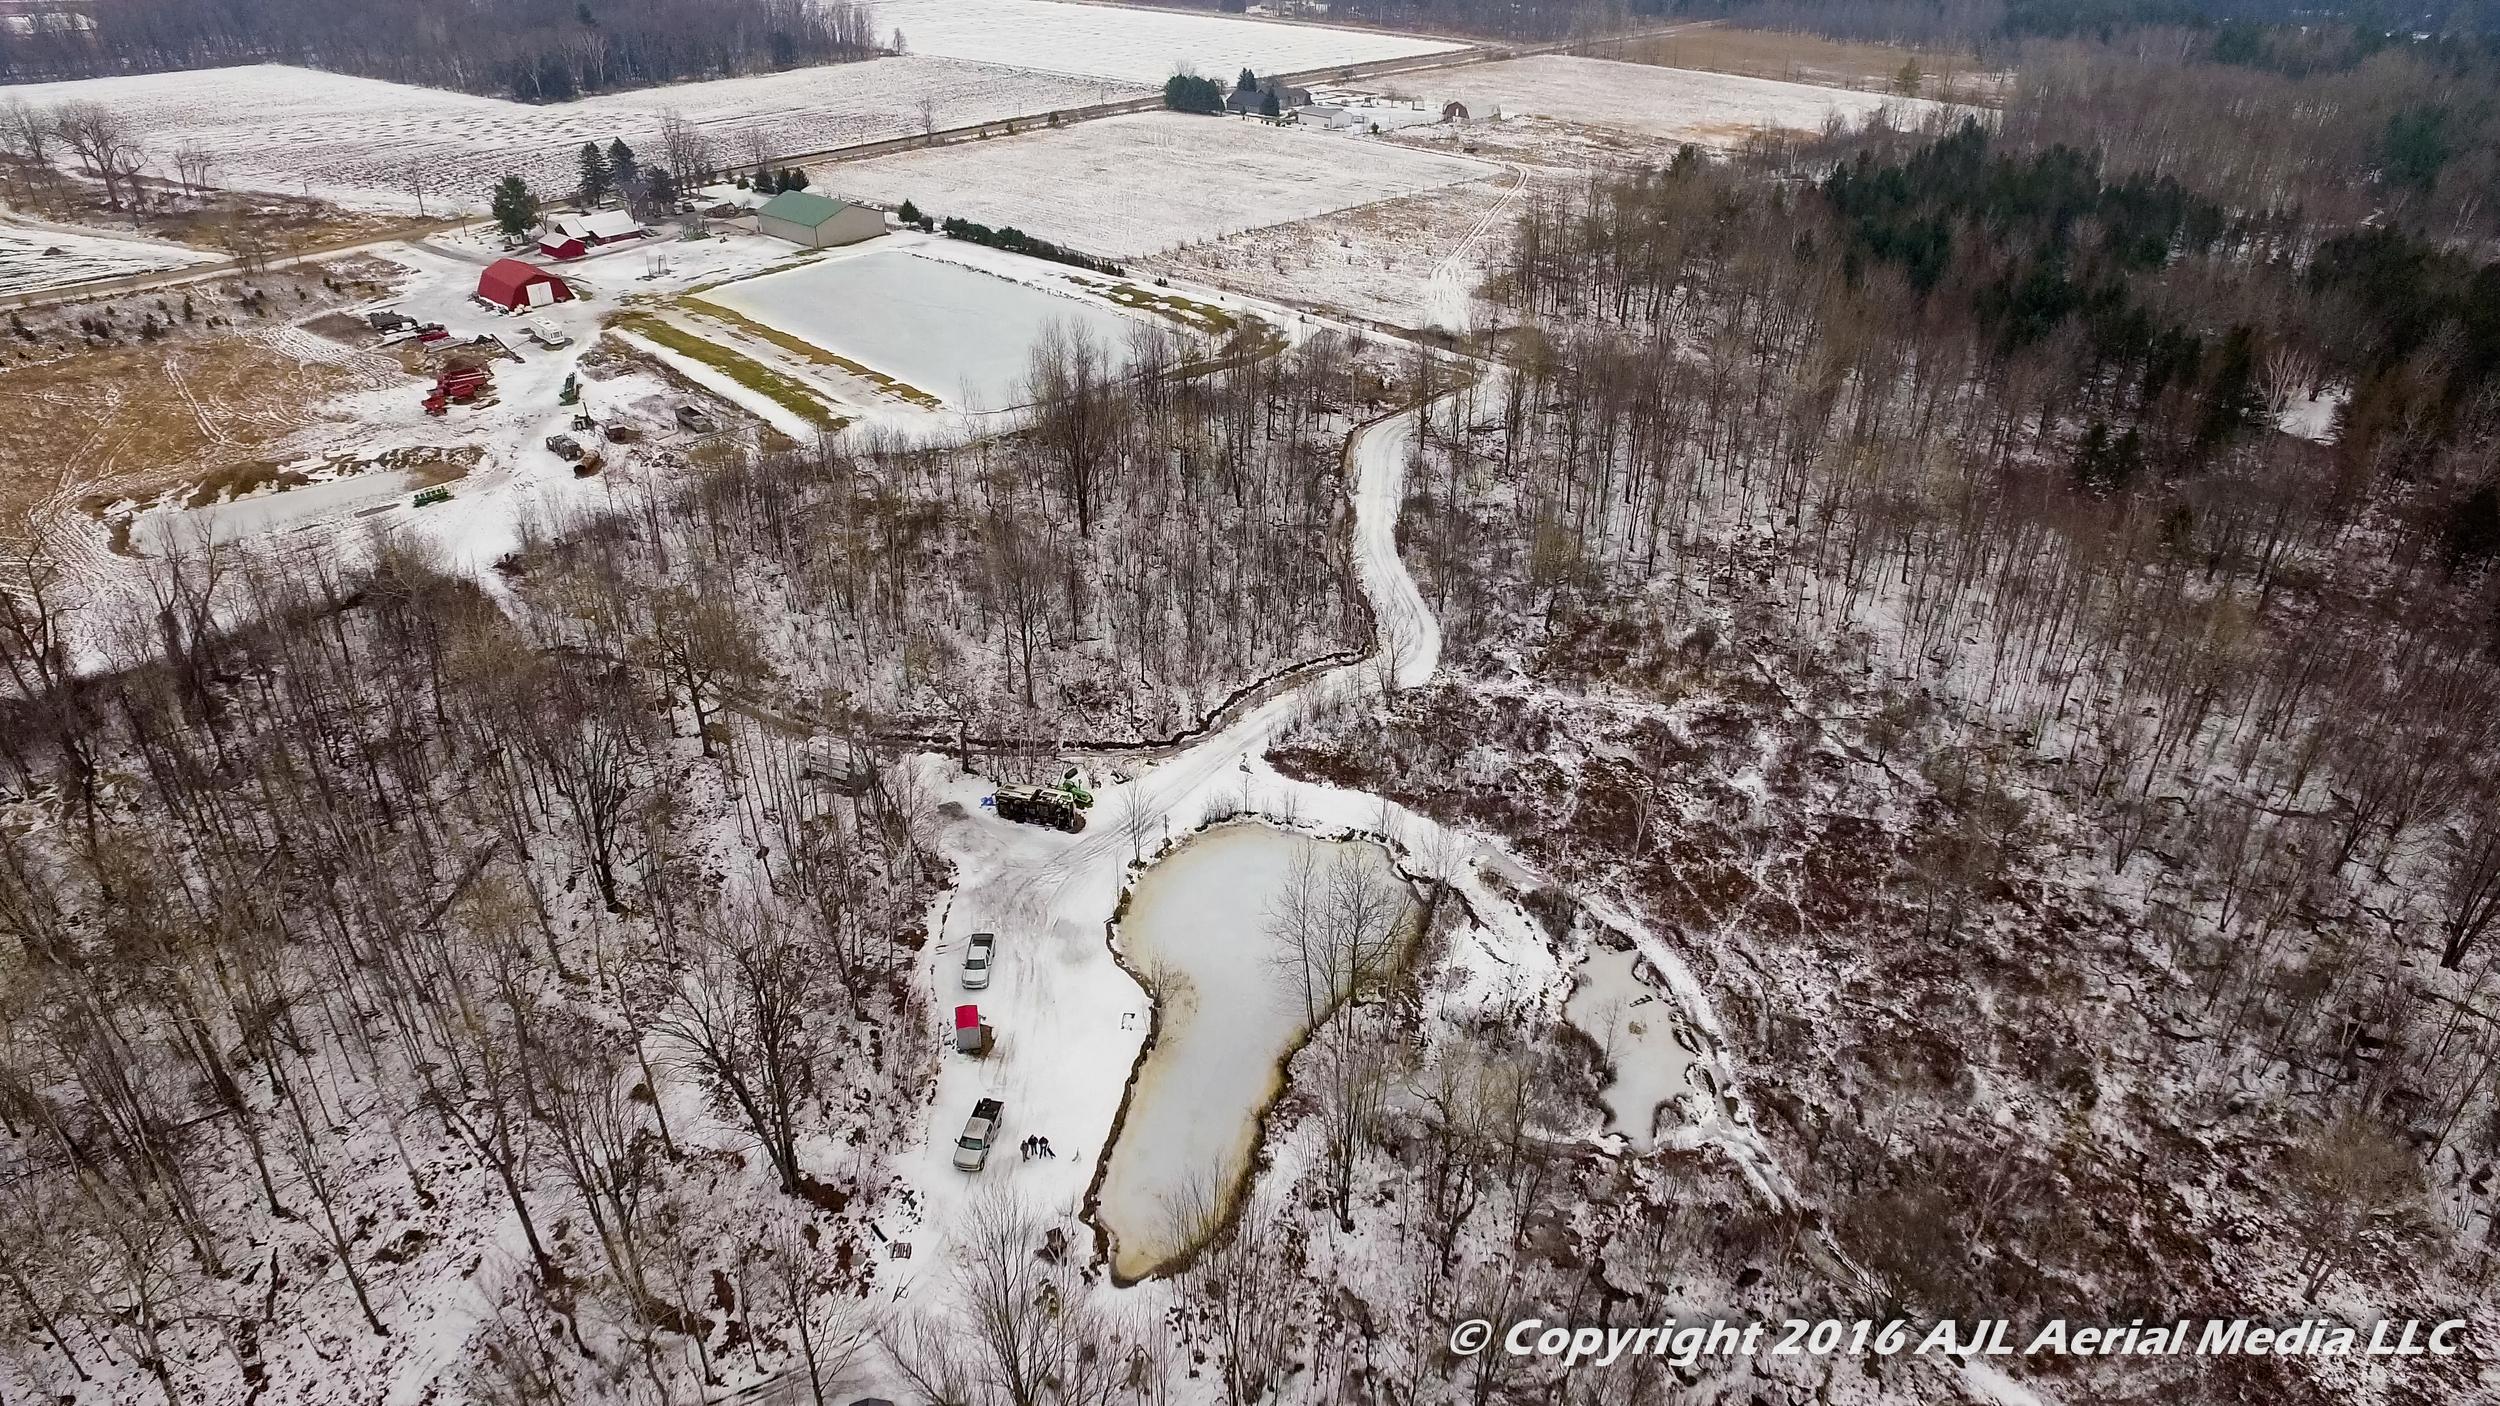 2016 Aerial Property Survey